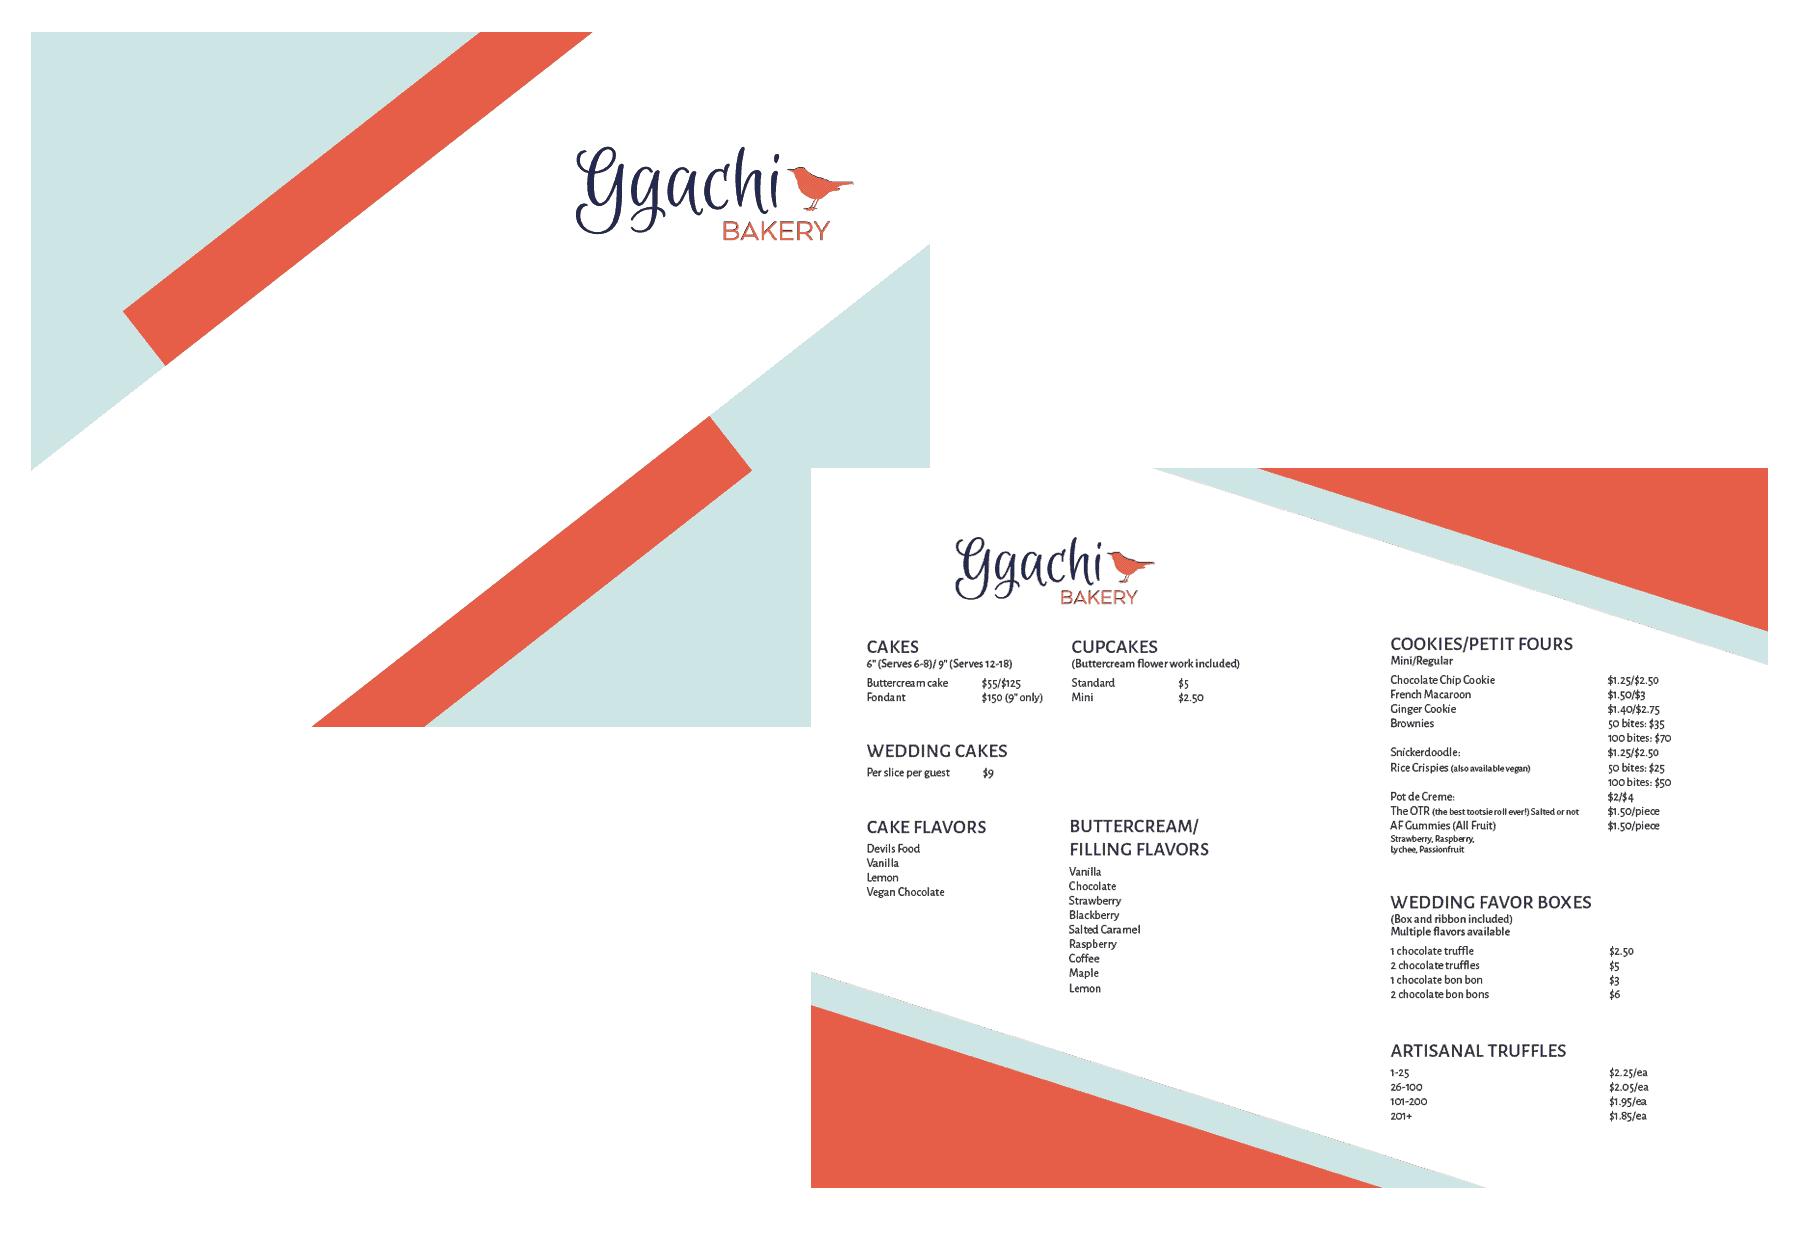 Ggachi-Bakery-Menus